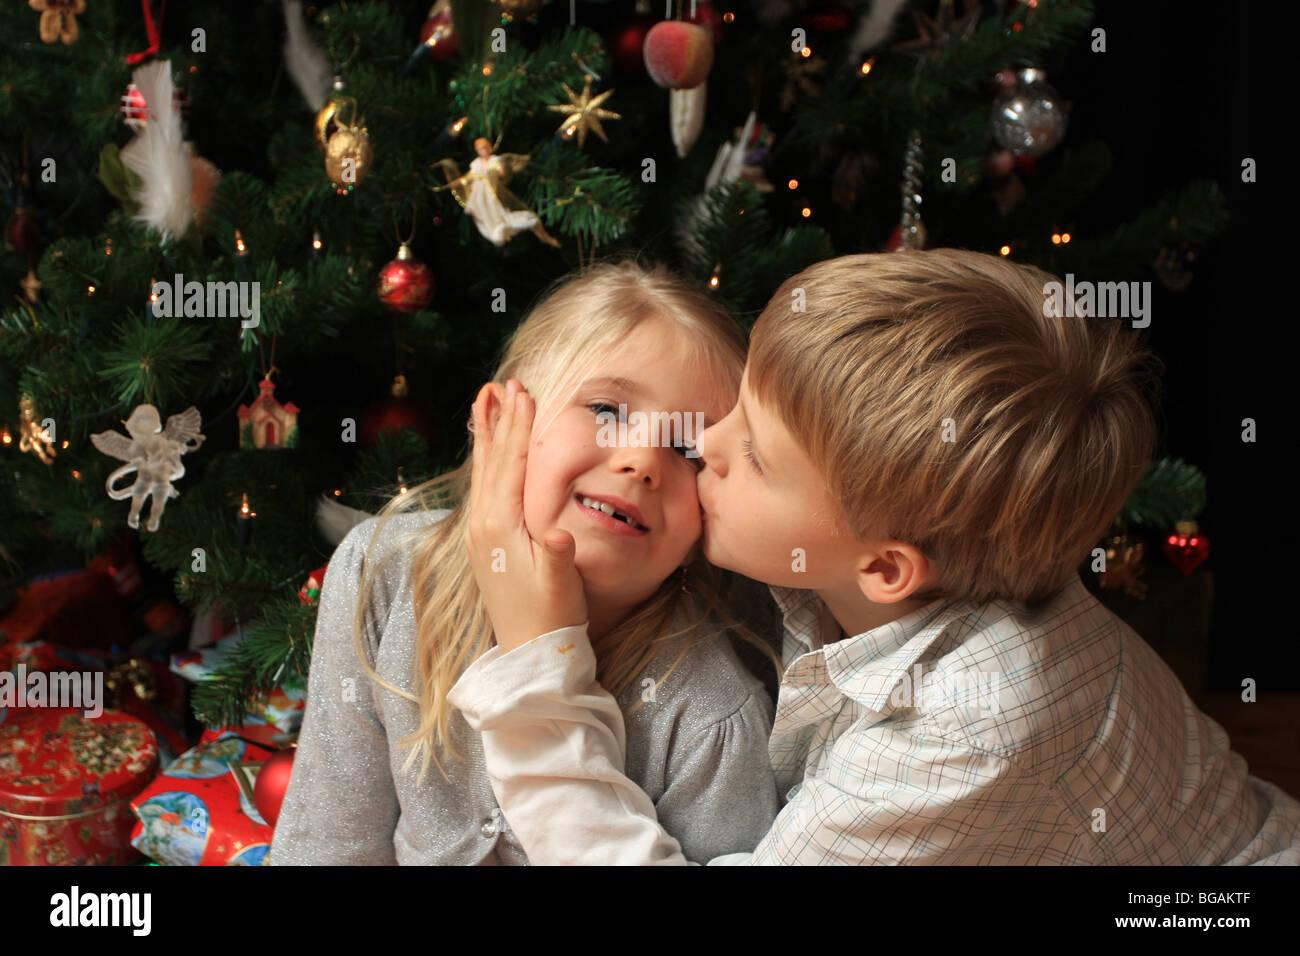 Boy dating his sister